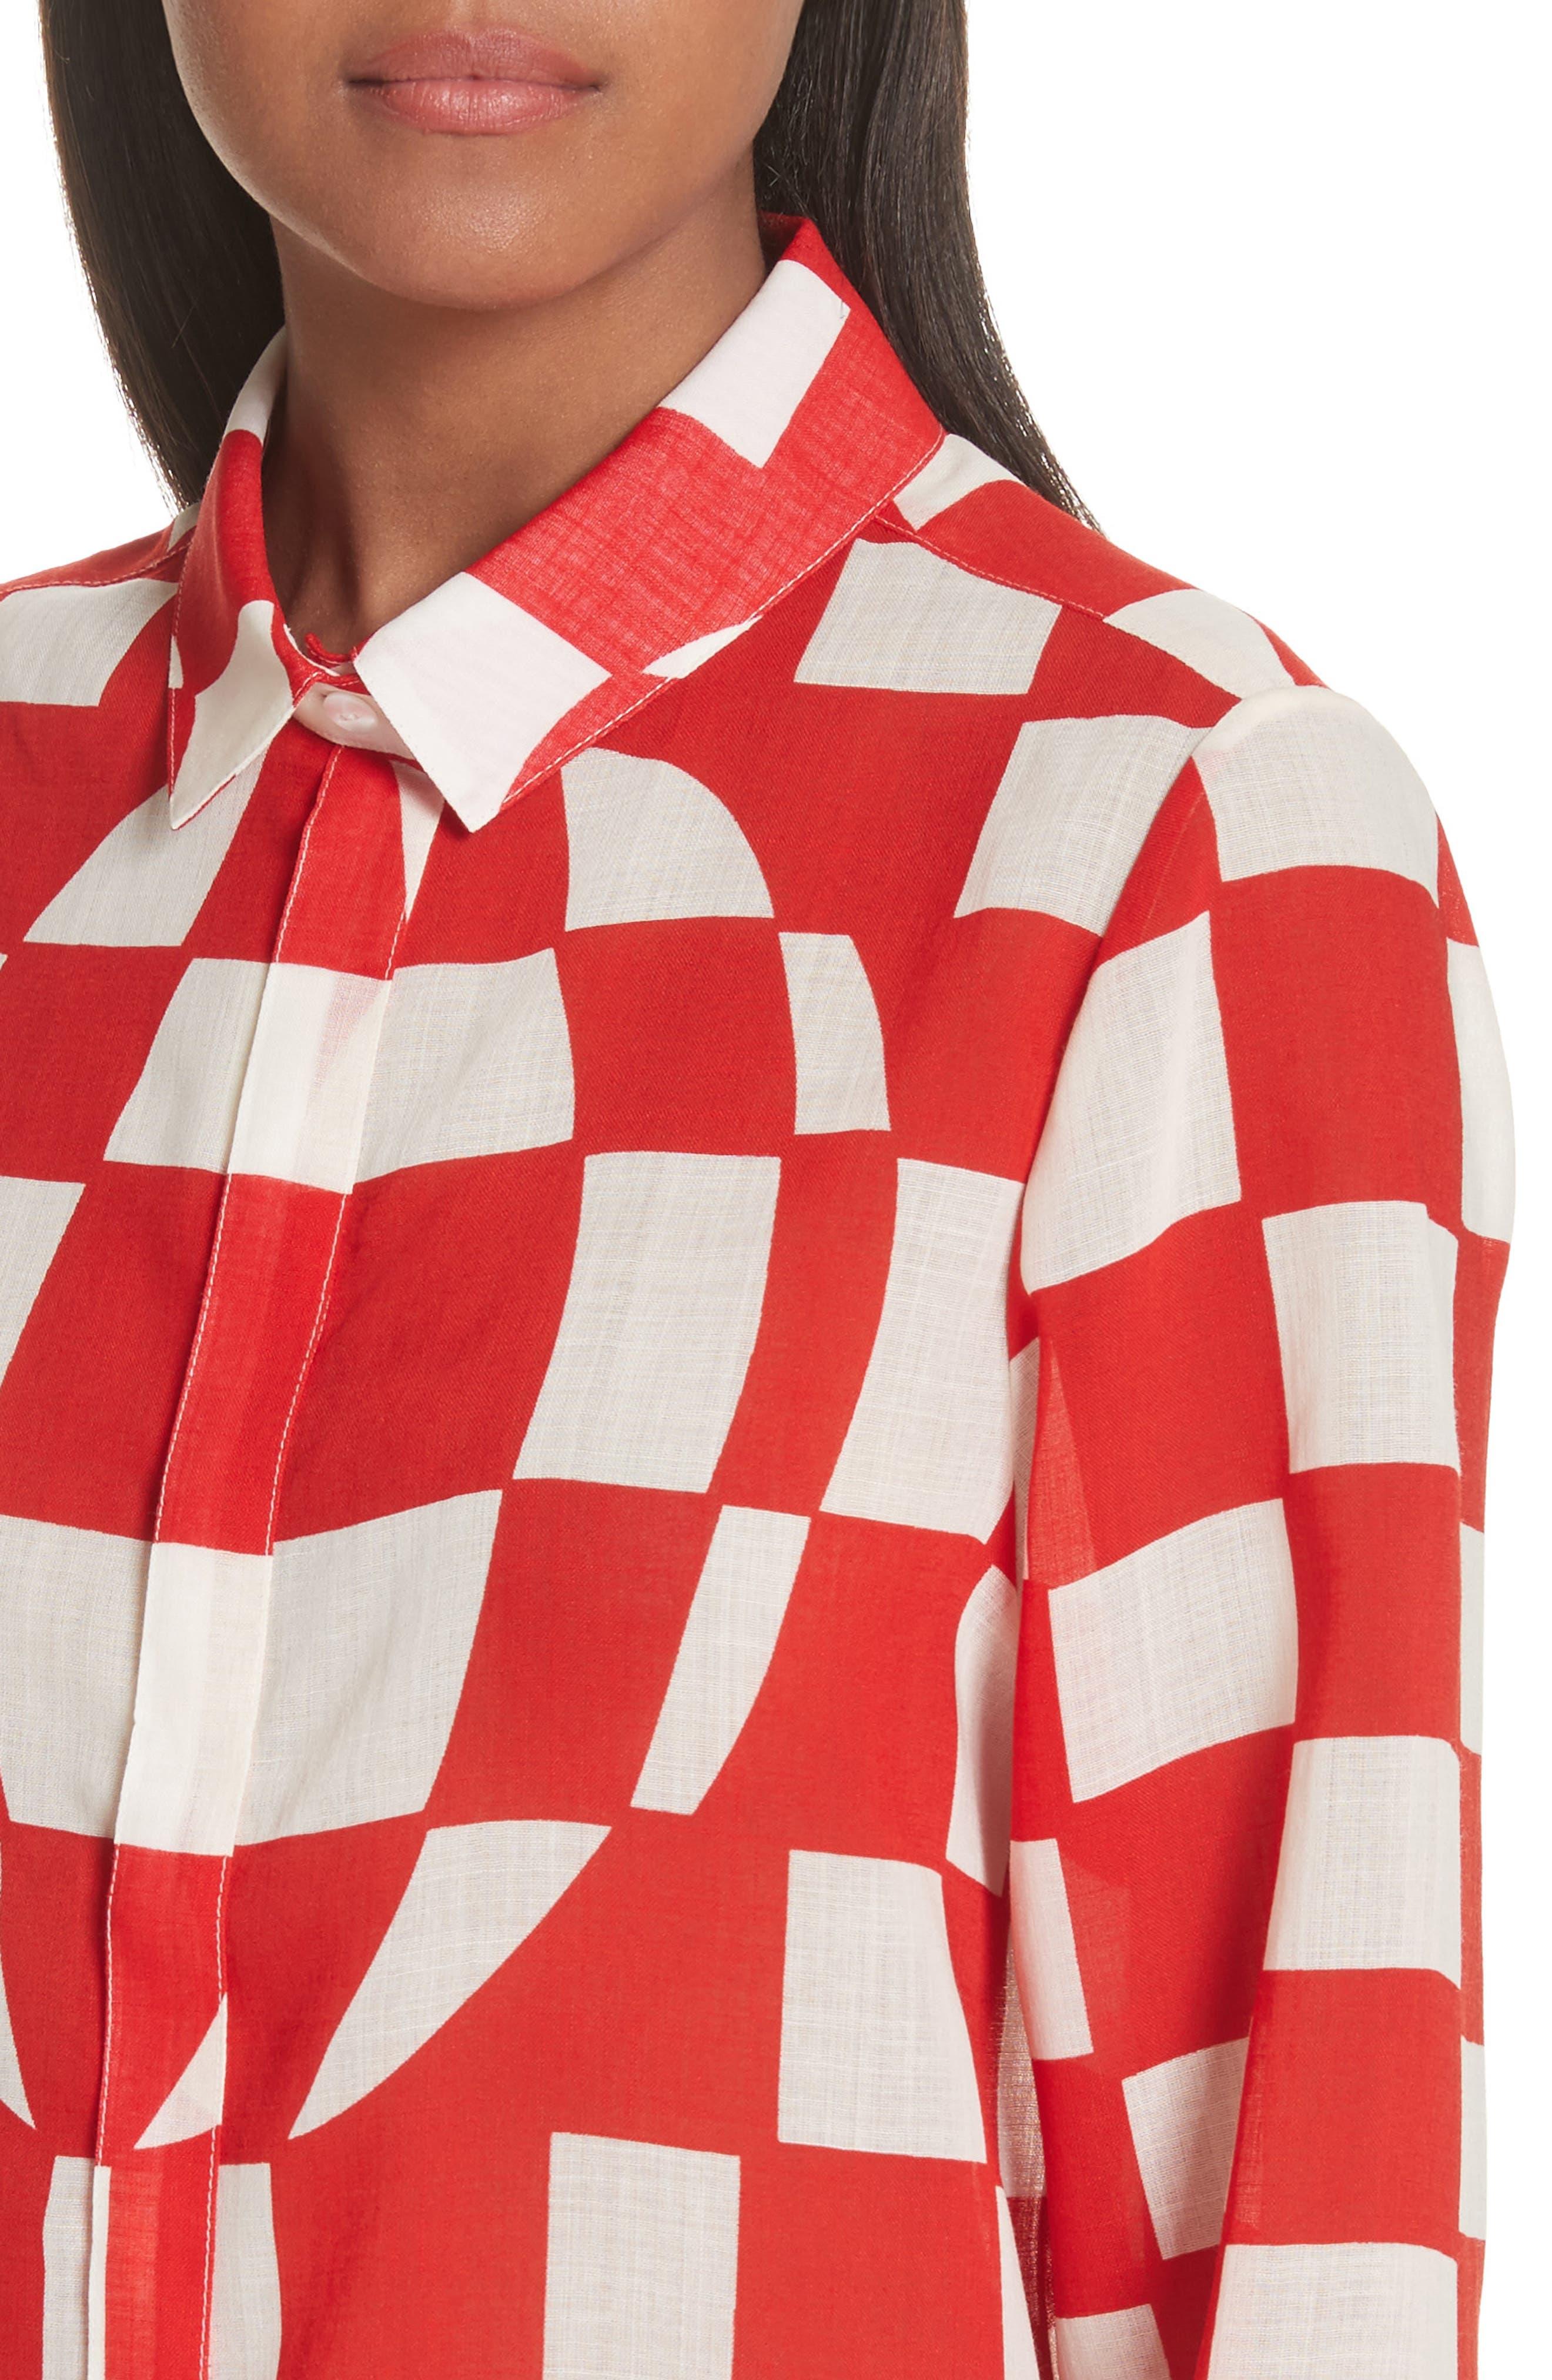 Checkerboard Print Blouse,                             Alternate thumbnail 4, color,                             600